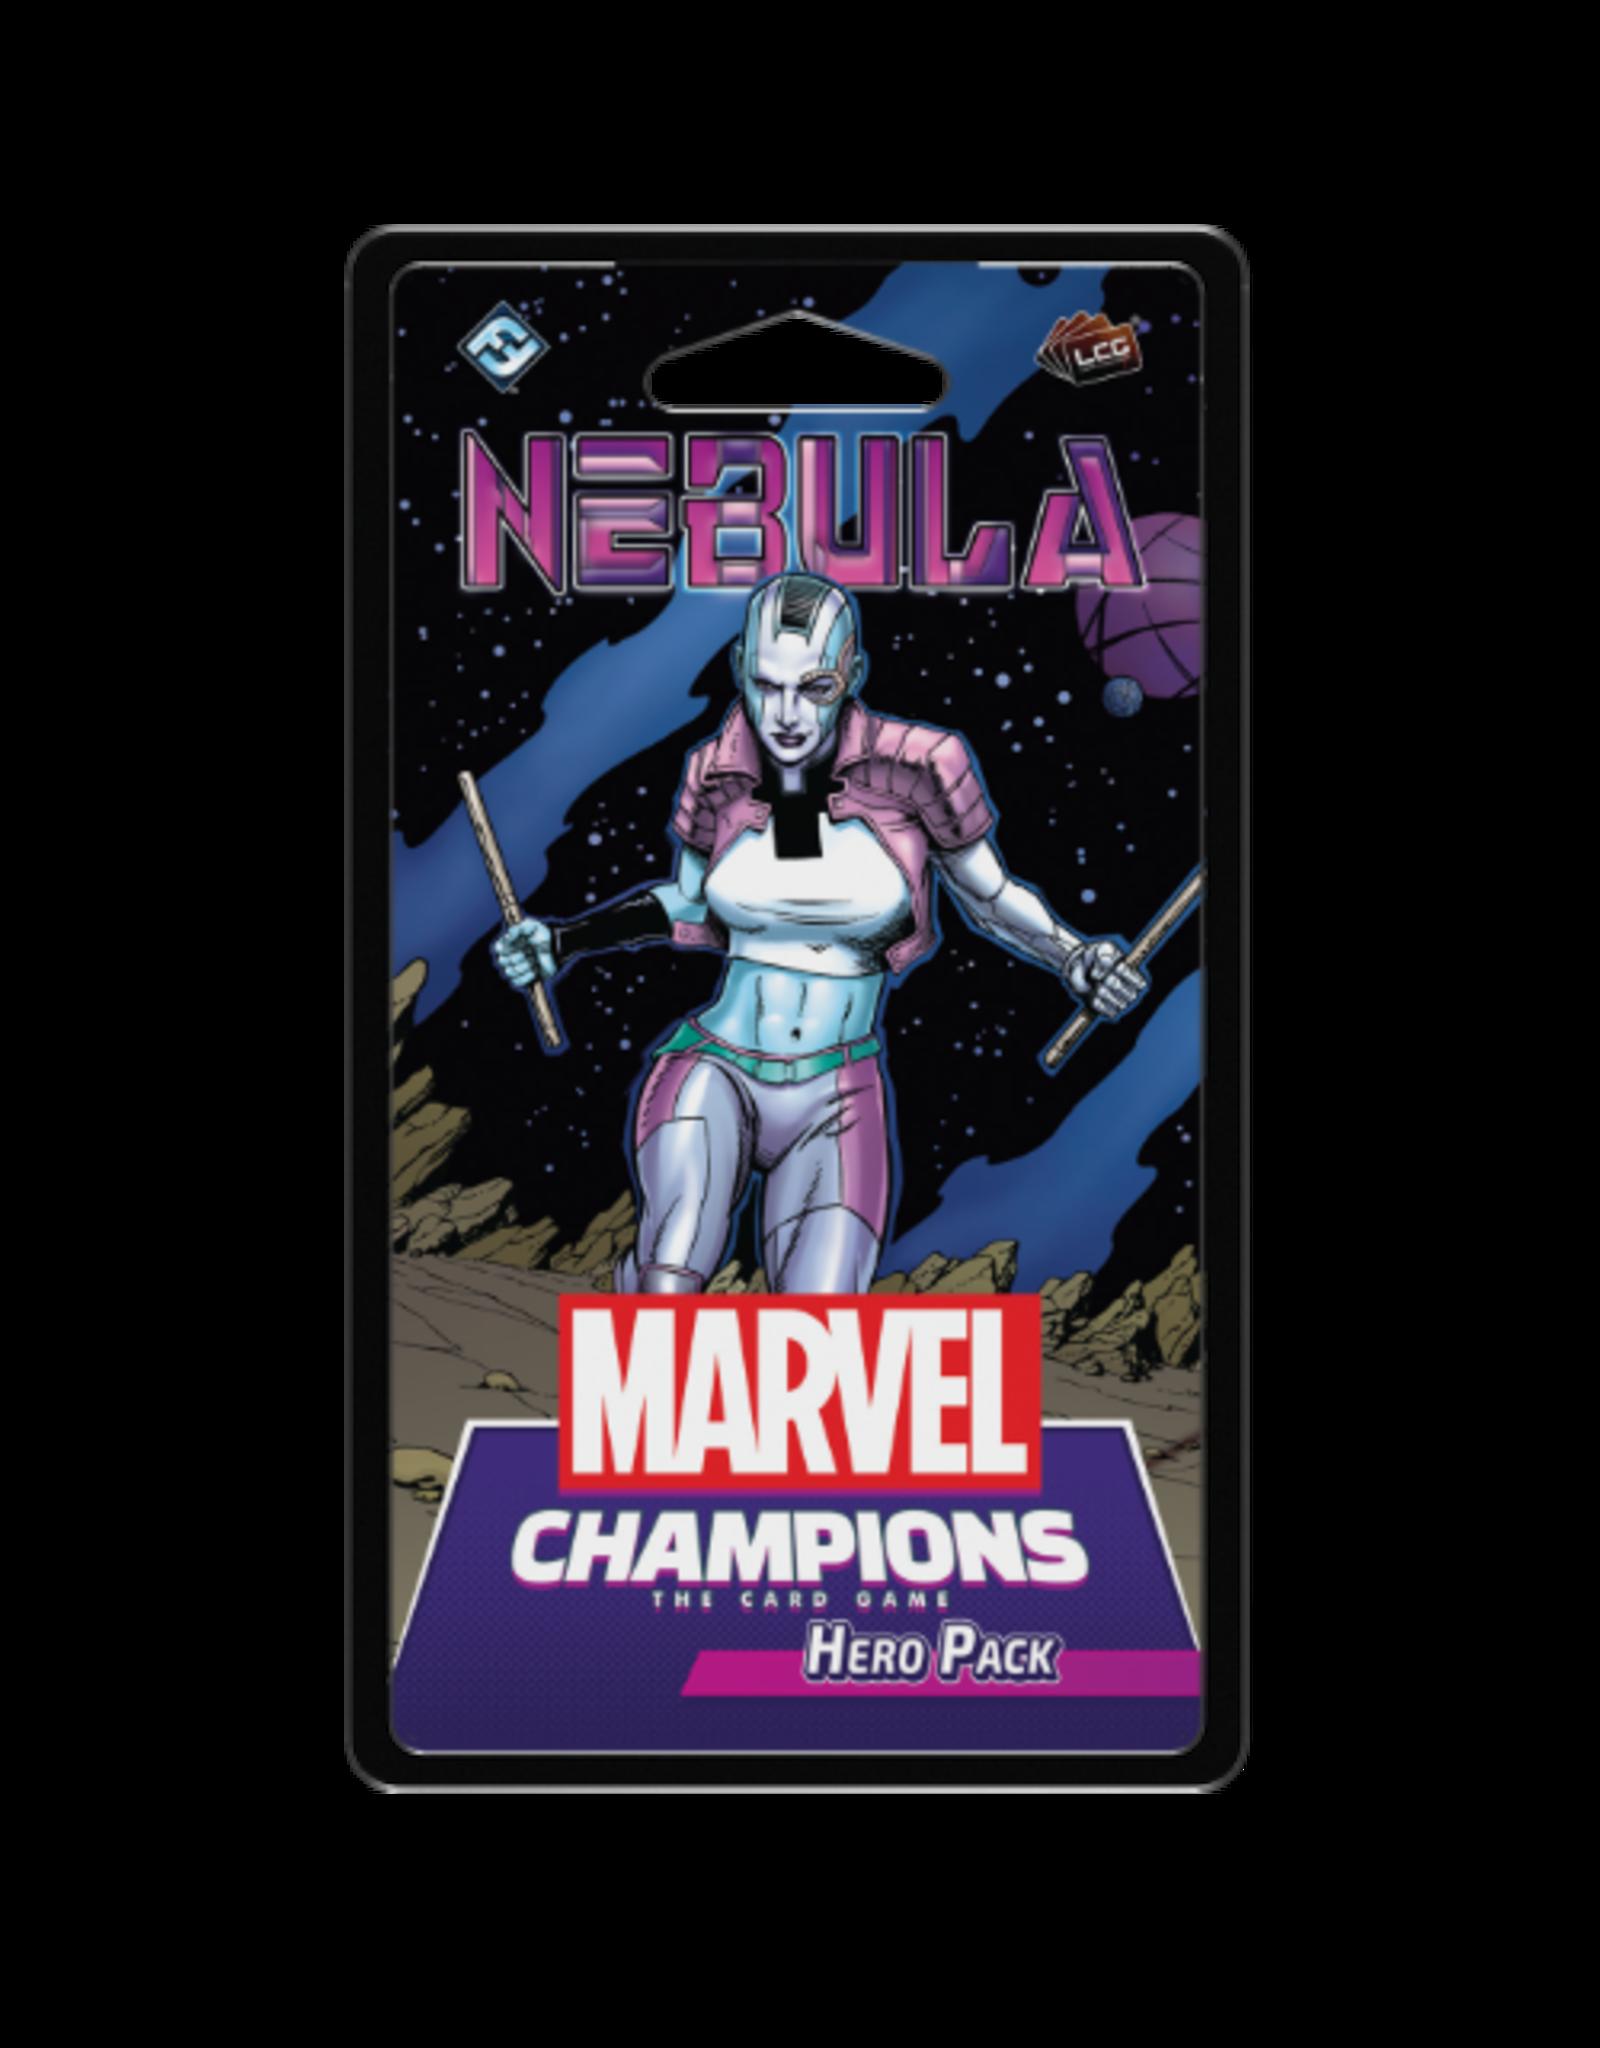 FANTASY FLIGHT GAMES MARVEL CHAMPIONS LCG: NEBULA HERO PACK PRE-ORDER